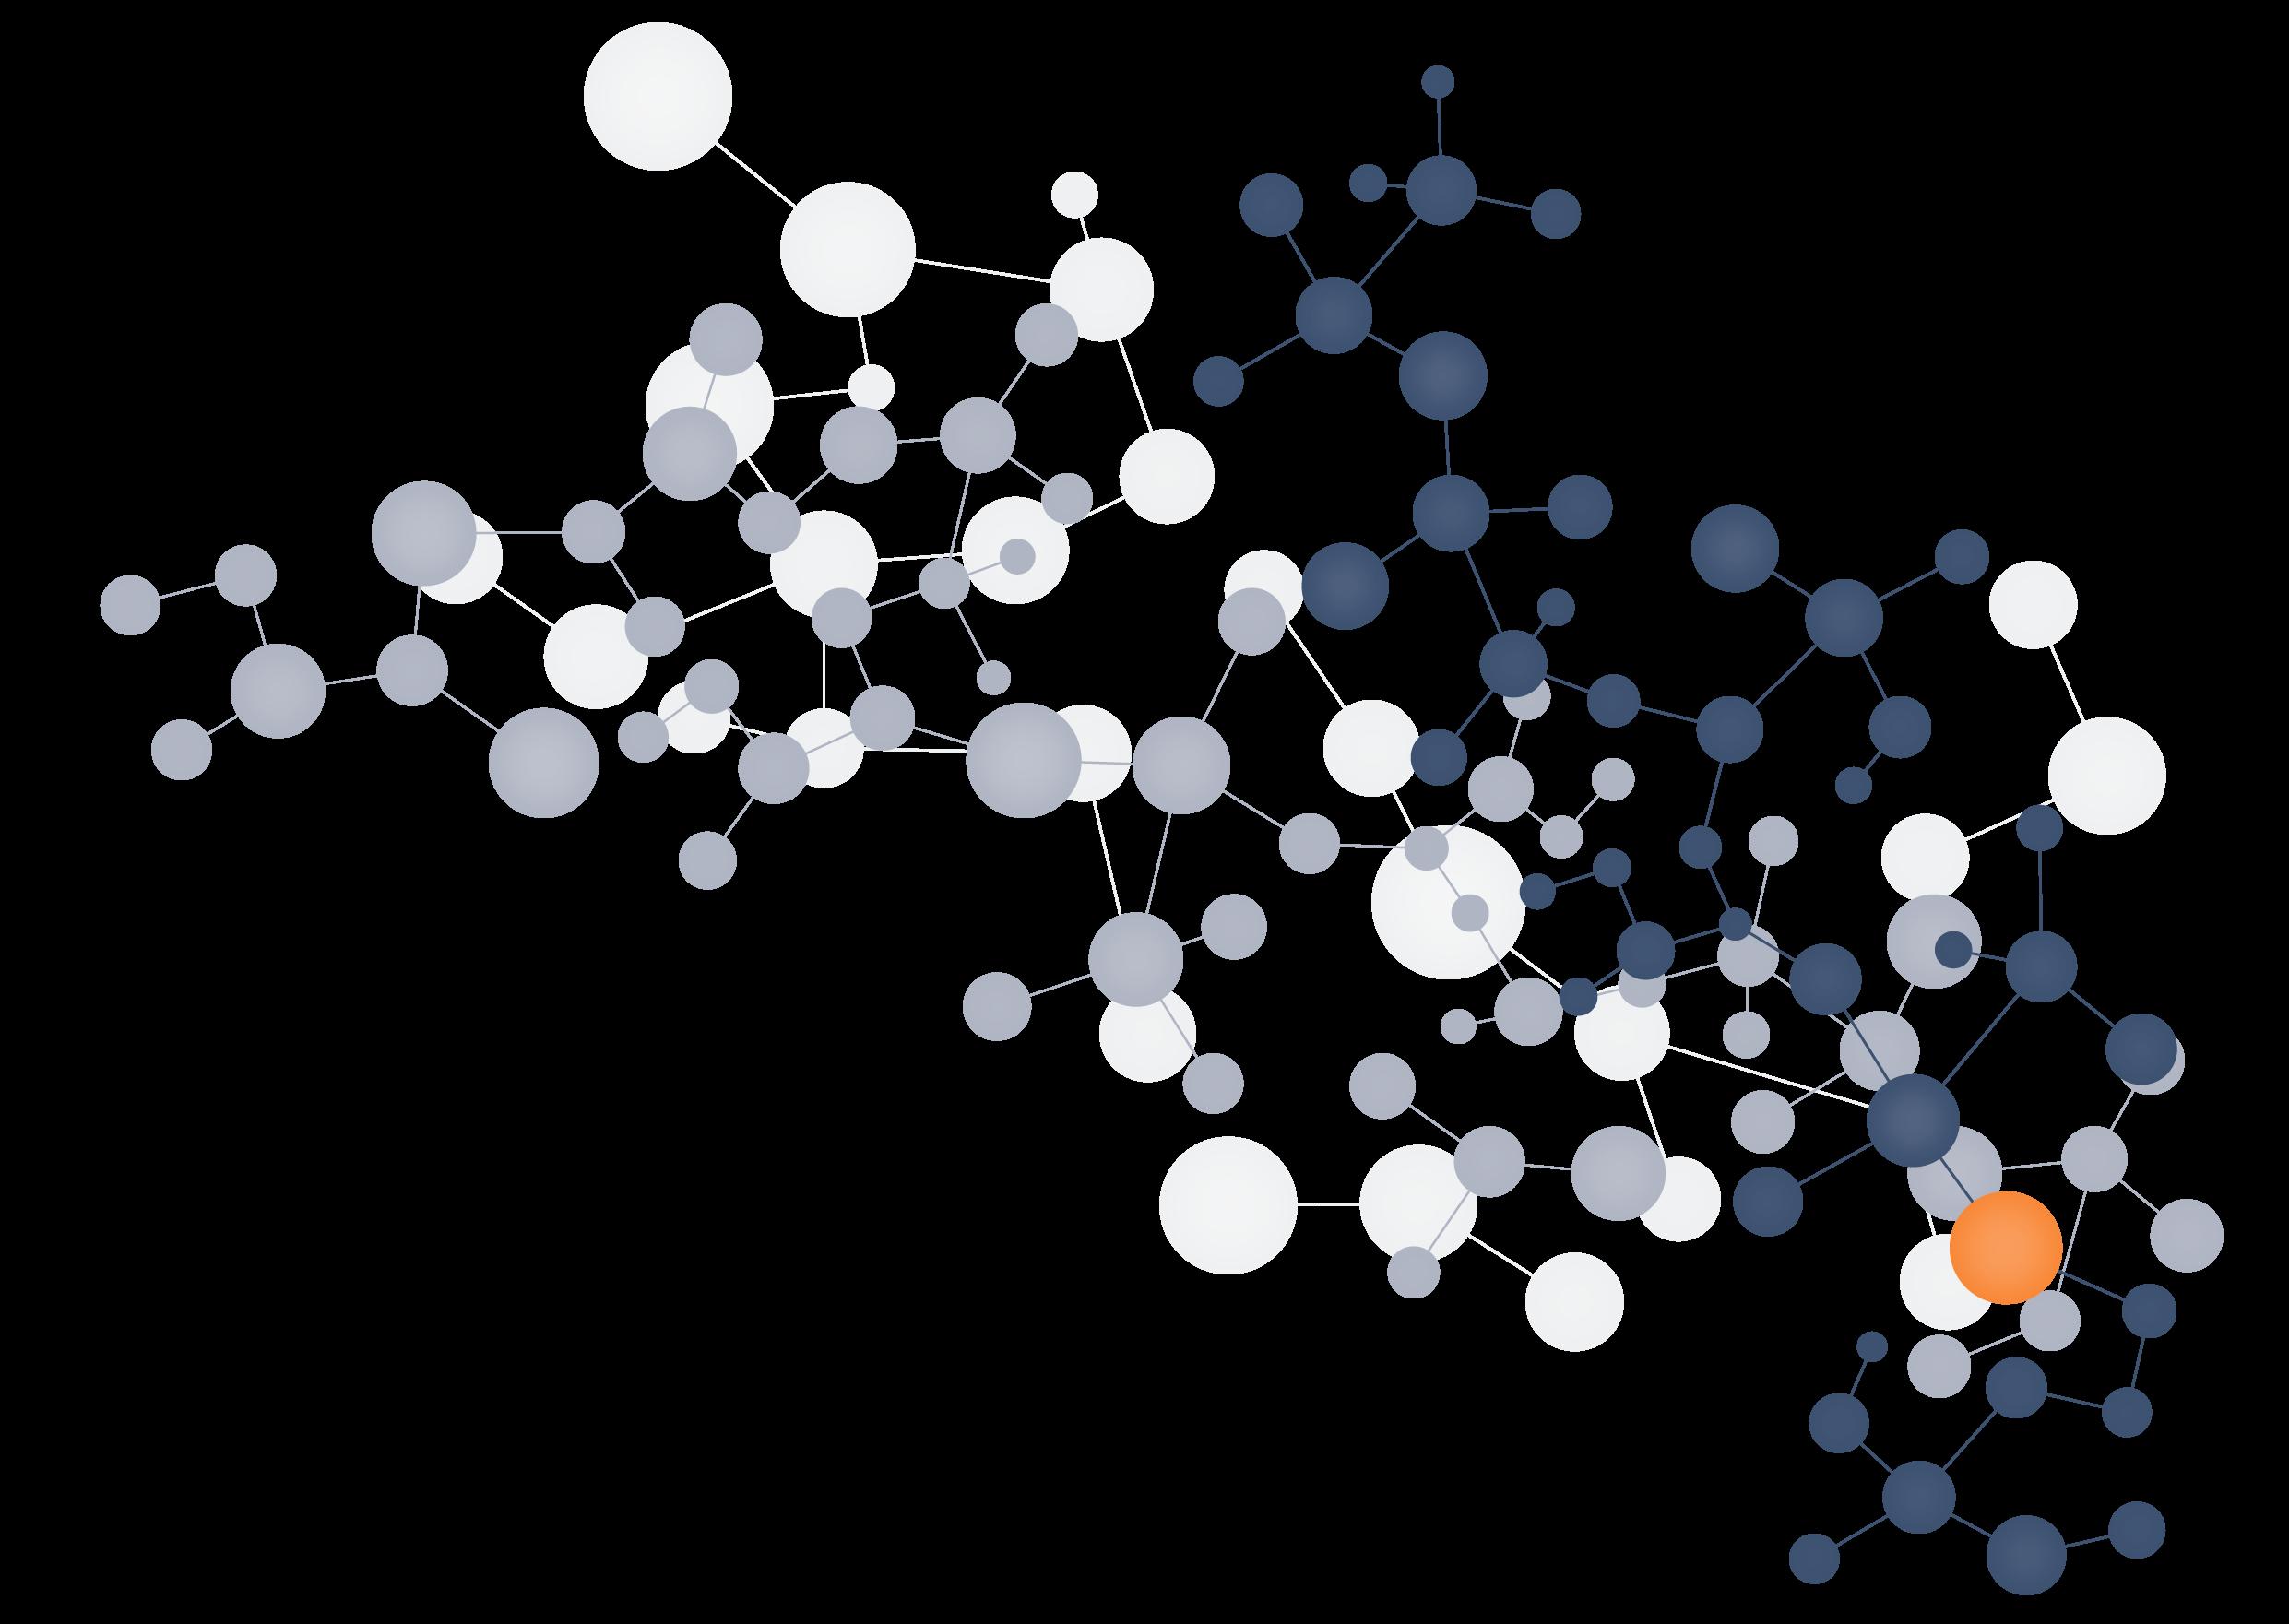 Molecule Transparent Background.